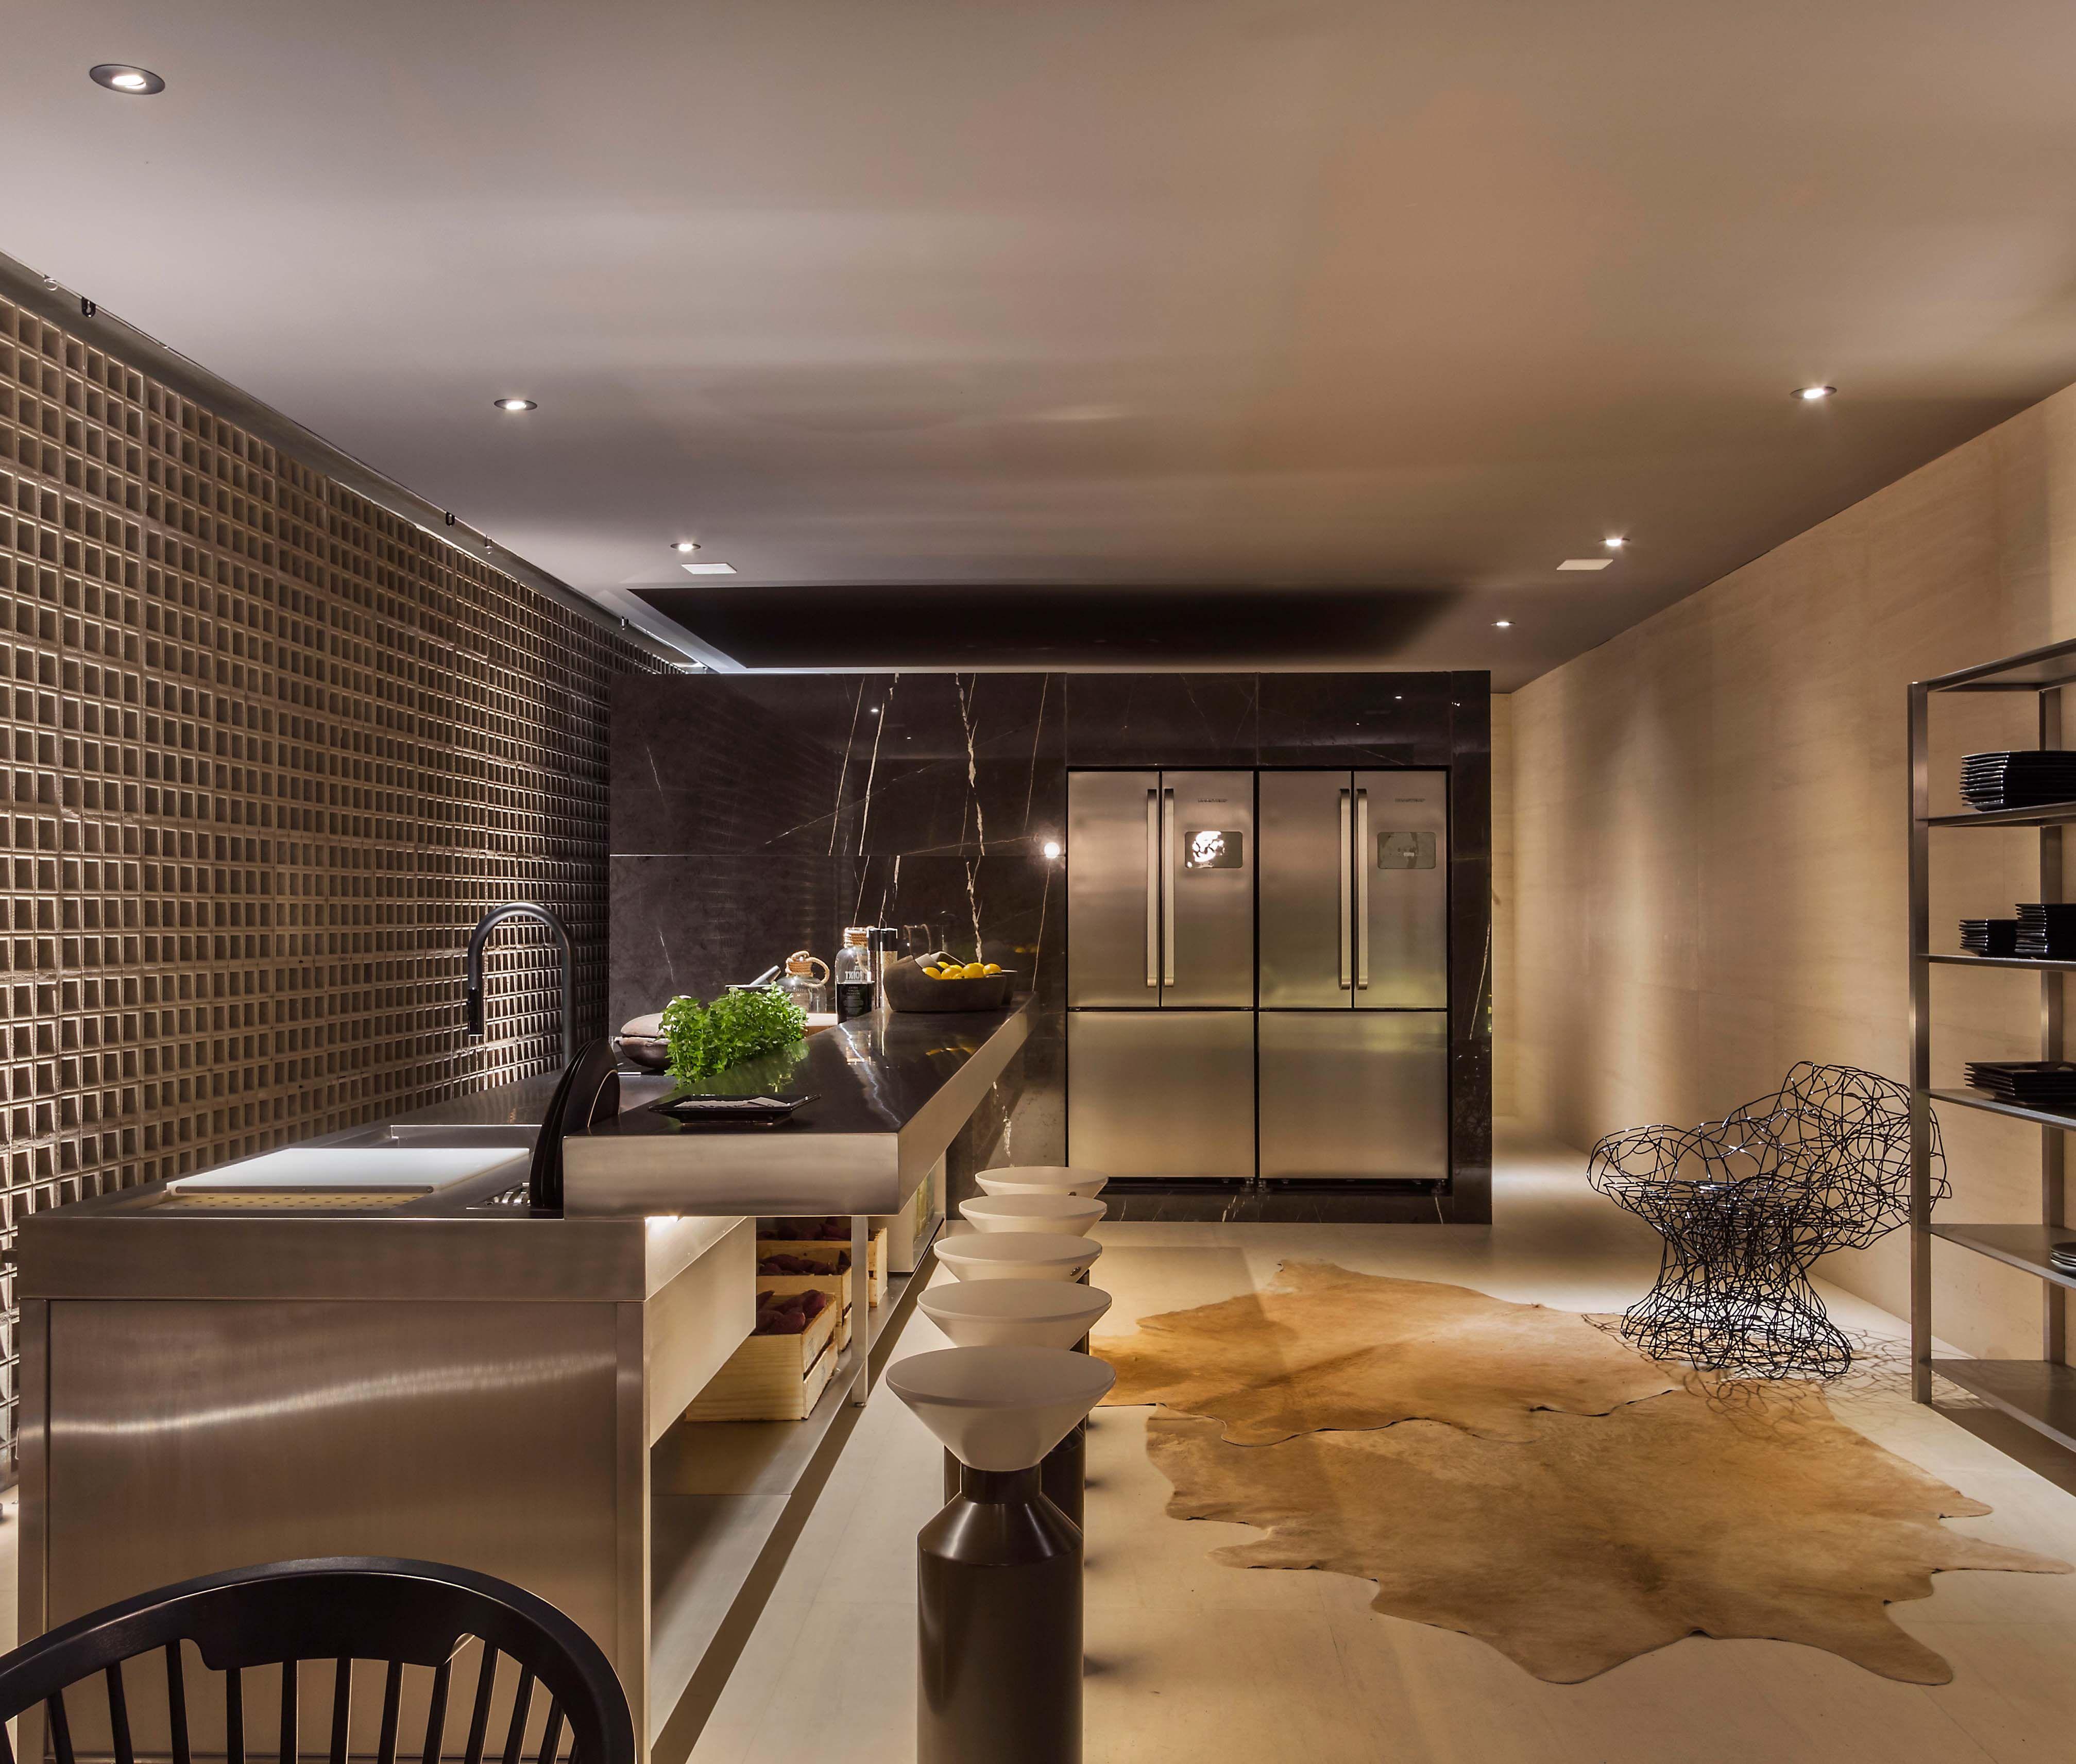 Casa cor sp villa deca by guilherme torres also design rh pinterest